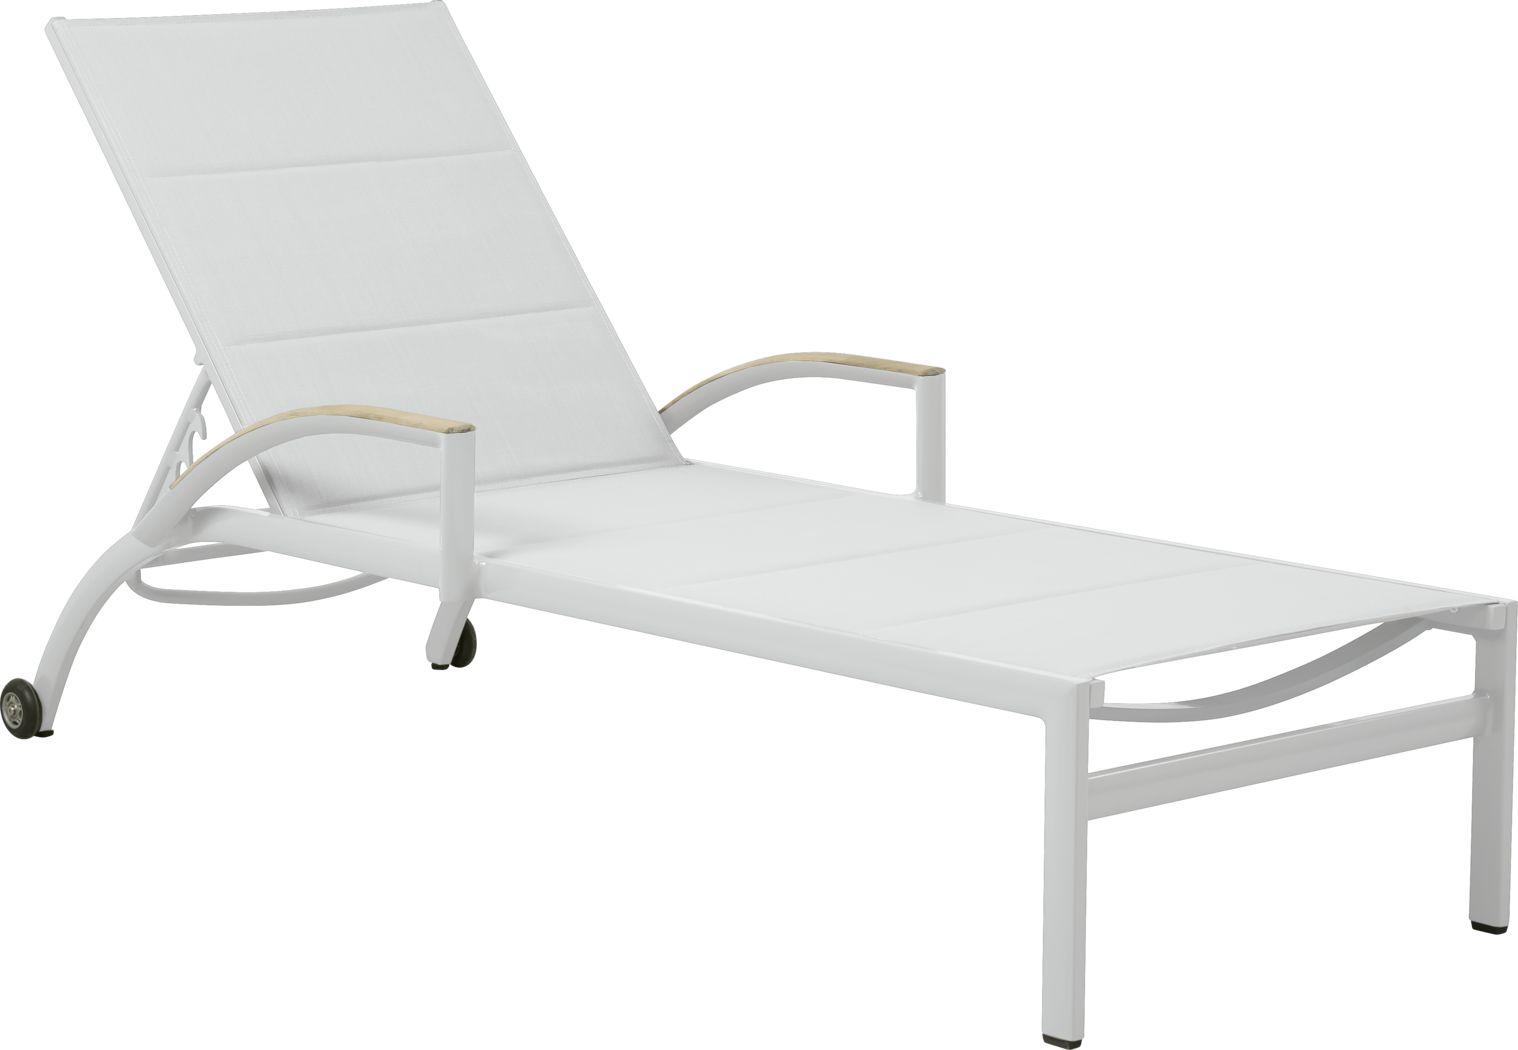 Solana White Outdoor Chaise